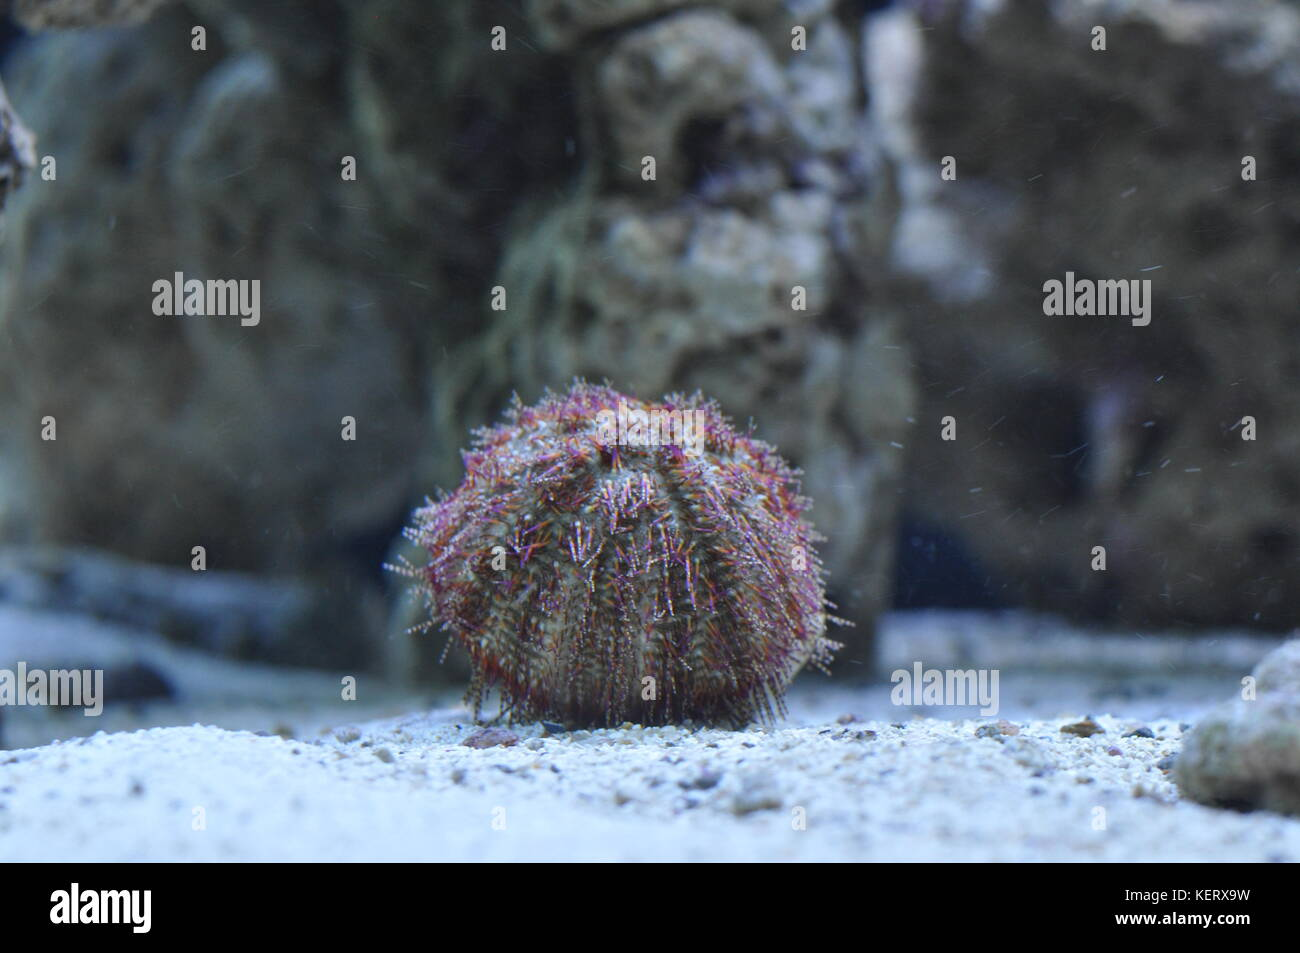 Sea Urchin - Marine Invertebrates - Stock Image